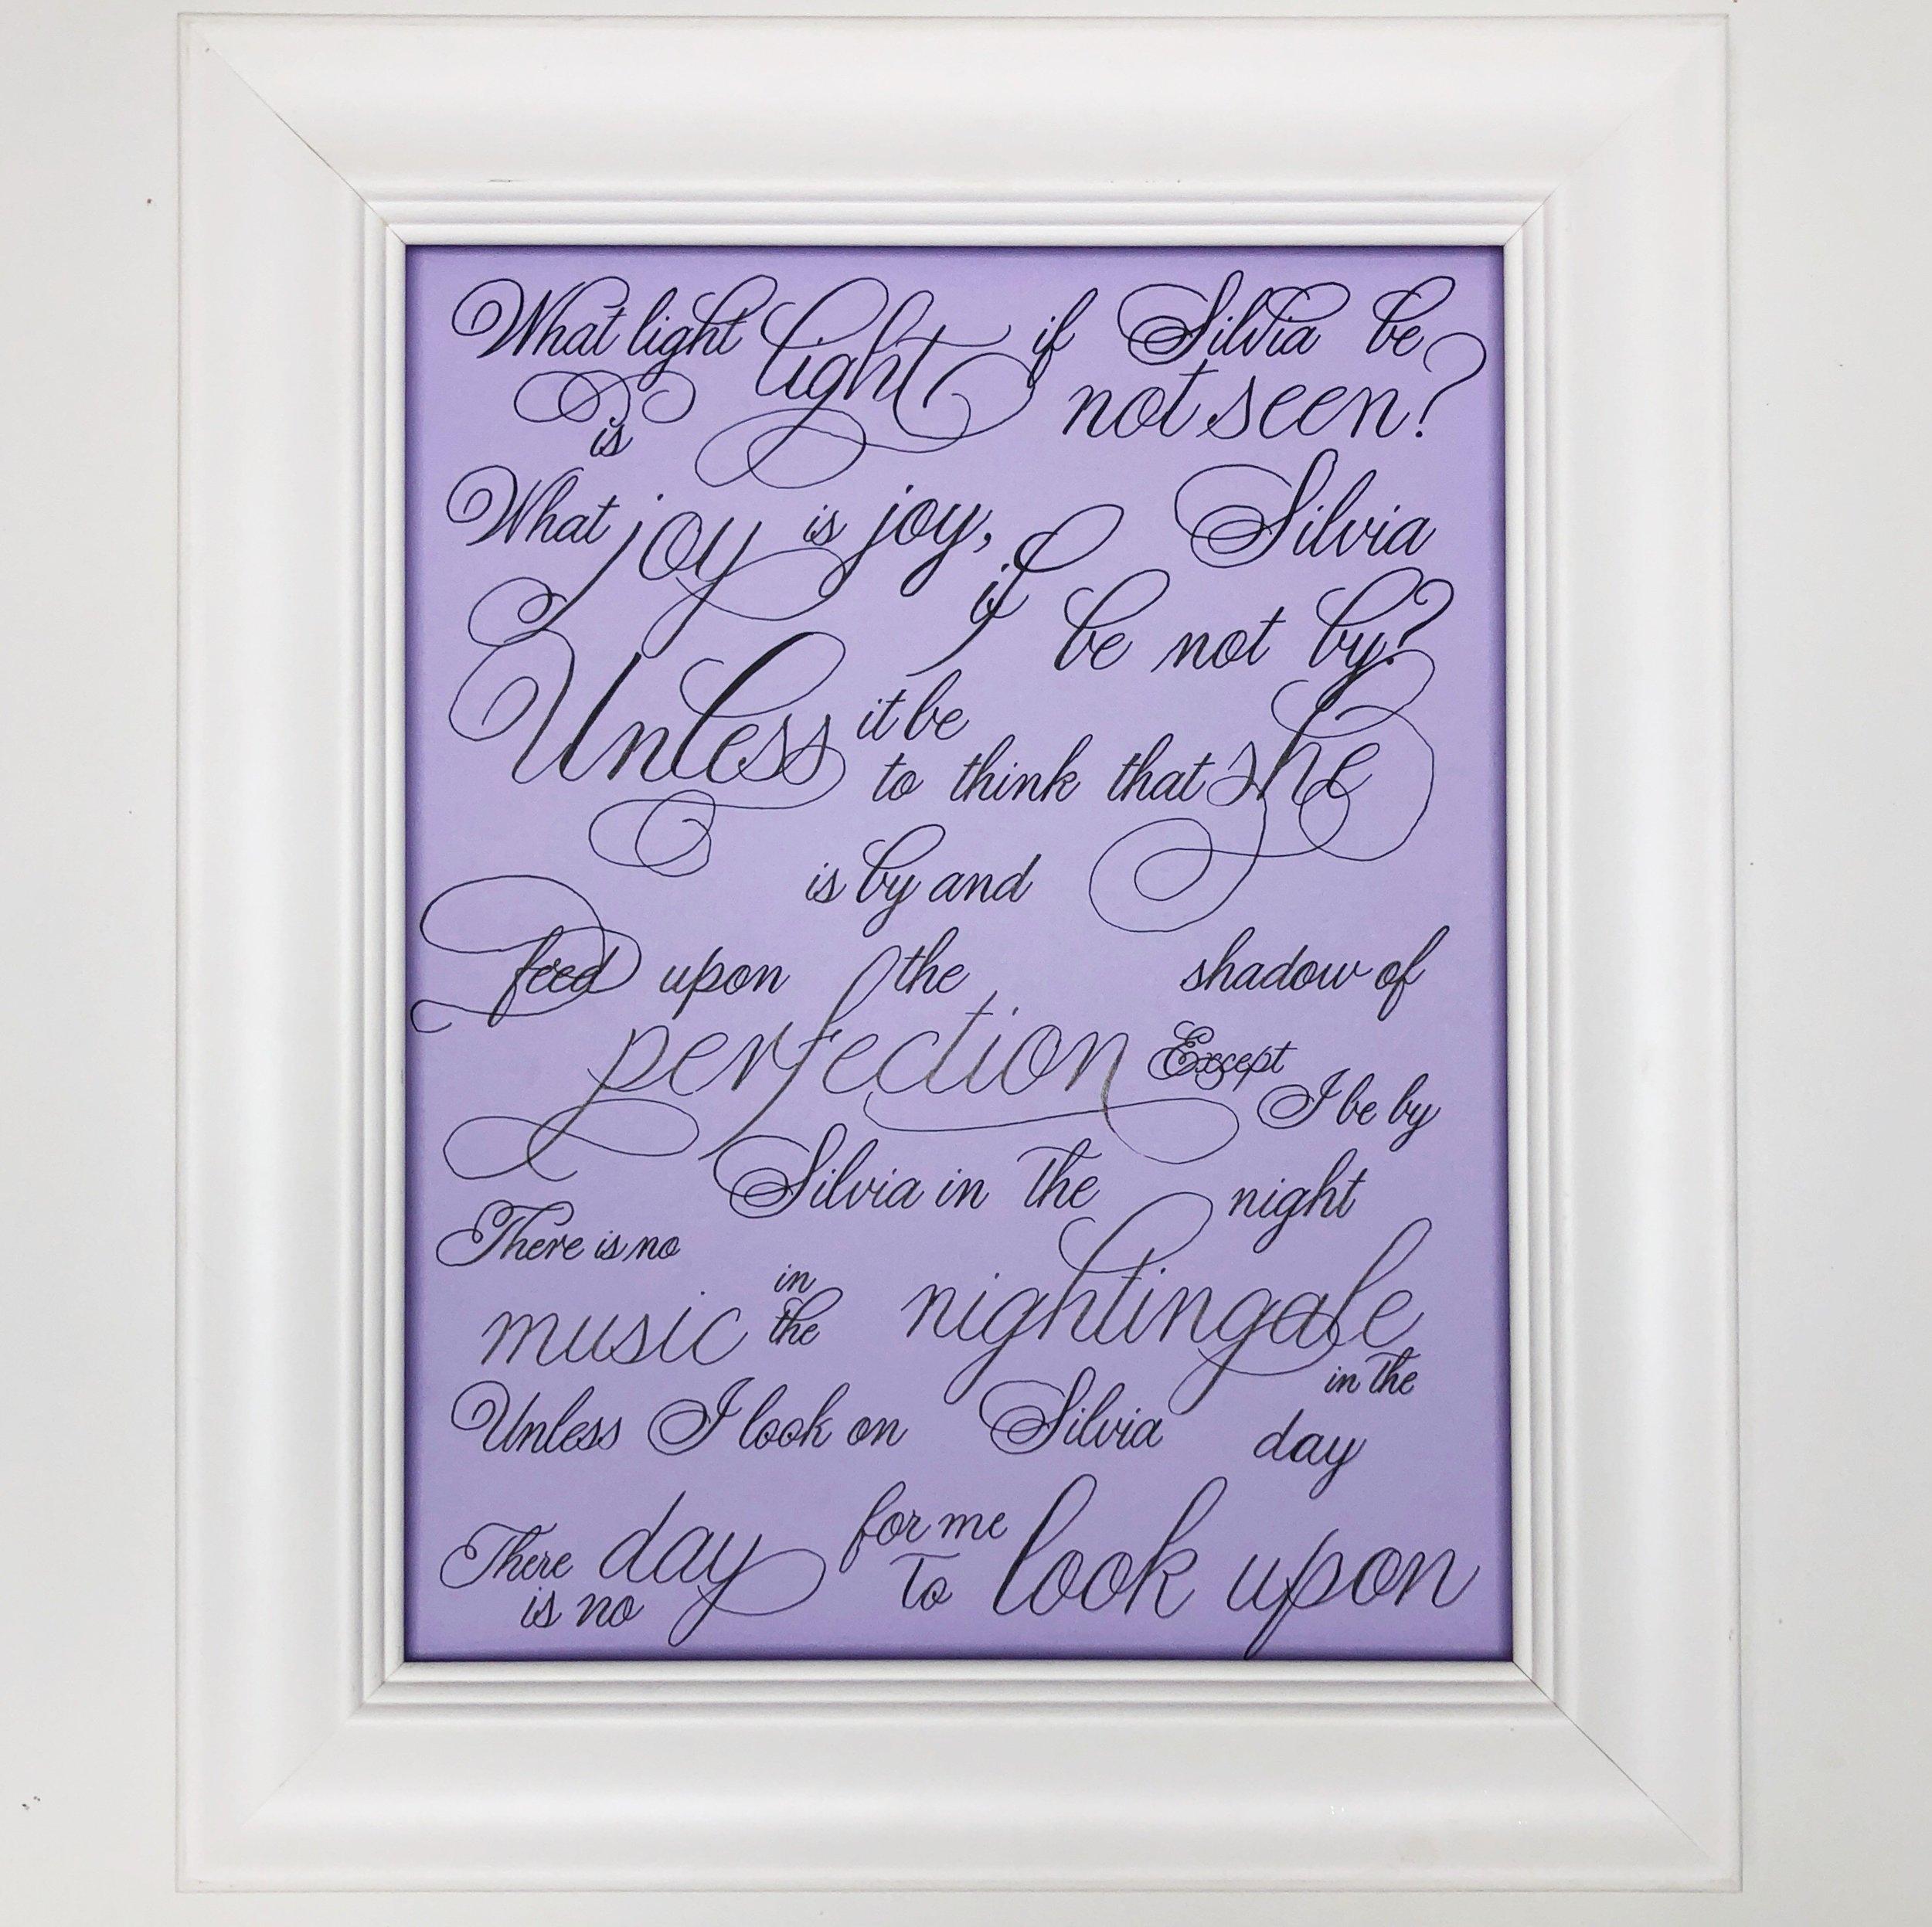 Central PA, York PA, JesSmith Designs, custom, wedding, invitations, bridal, Harrisburg, hanover, calligraphy, baltimore, wedding invitations, lancaster, gettysburg, 10-15 19.44.55.jpg